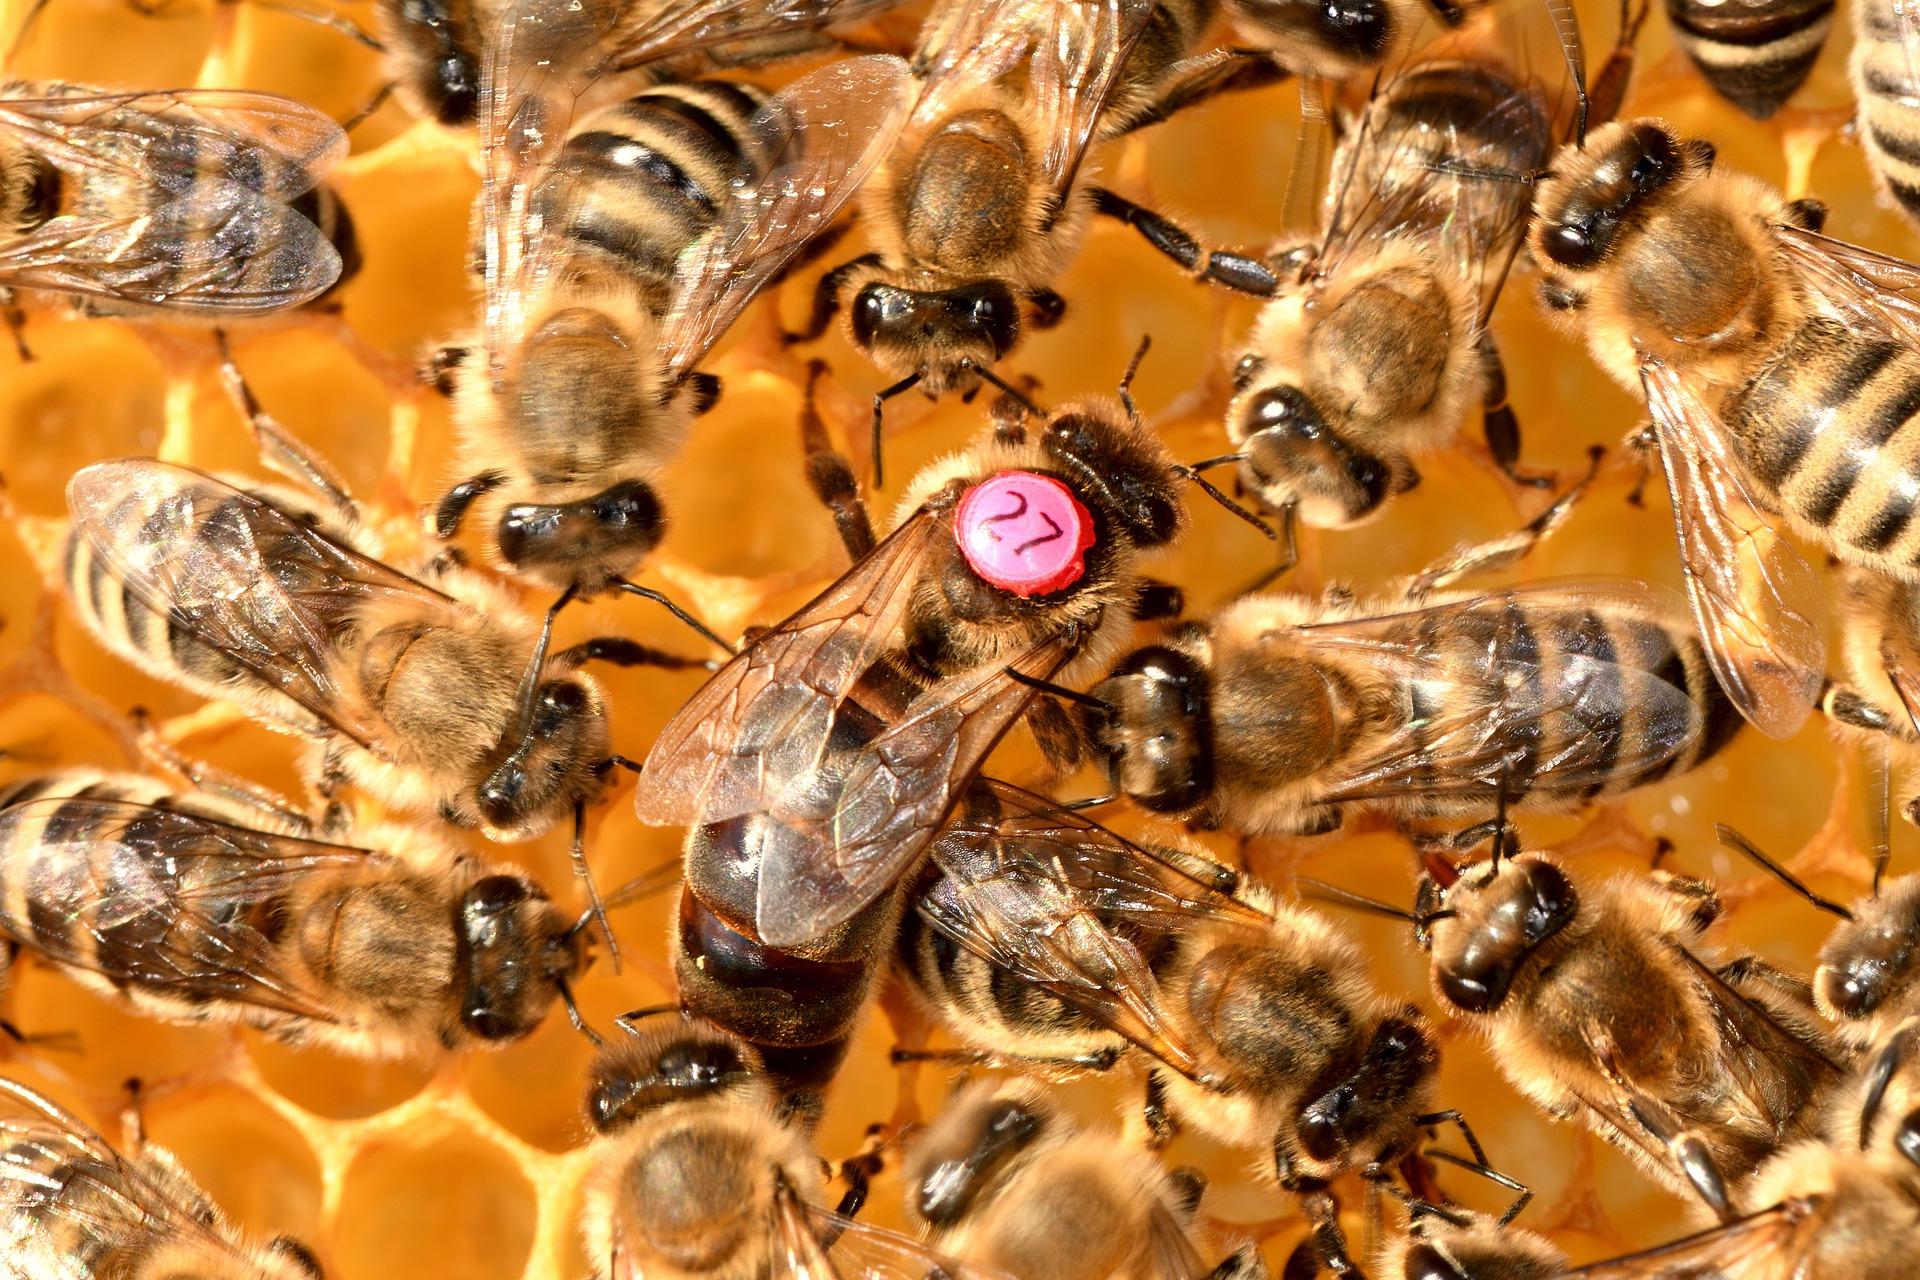 Image of a queen honey bee in her colony